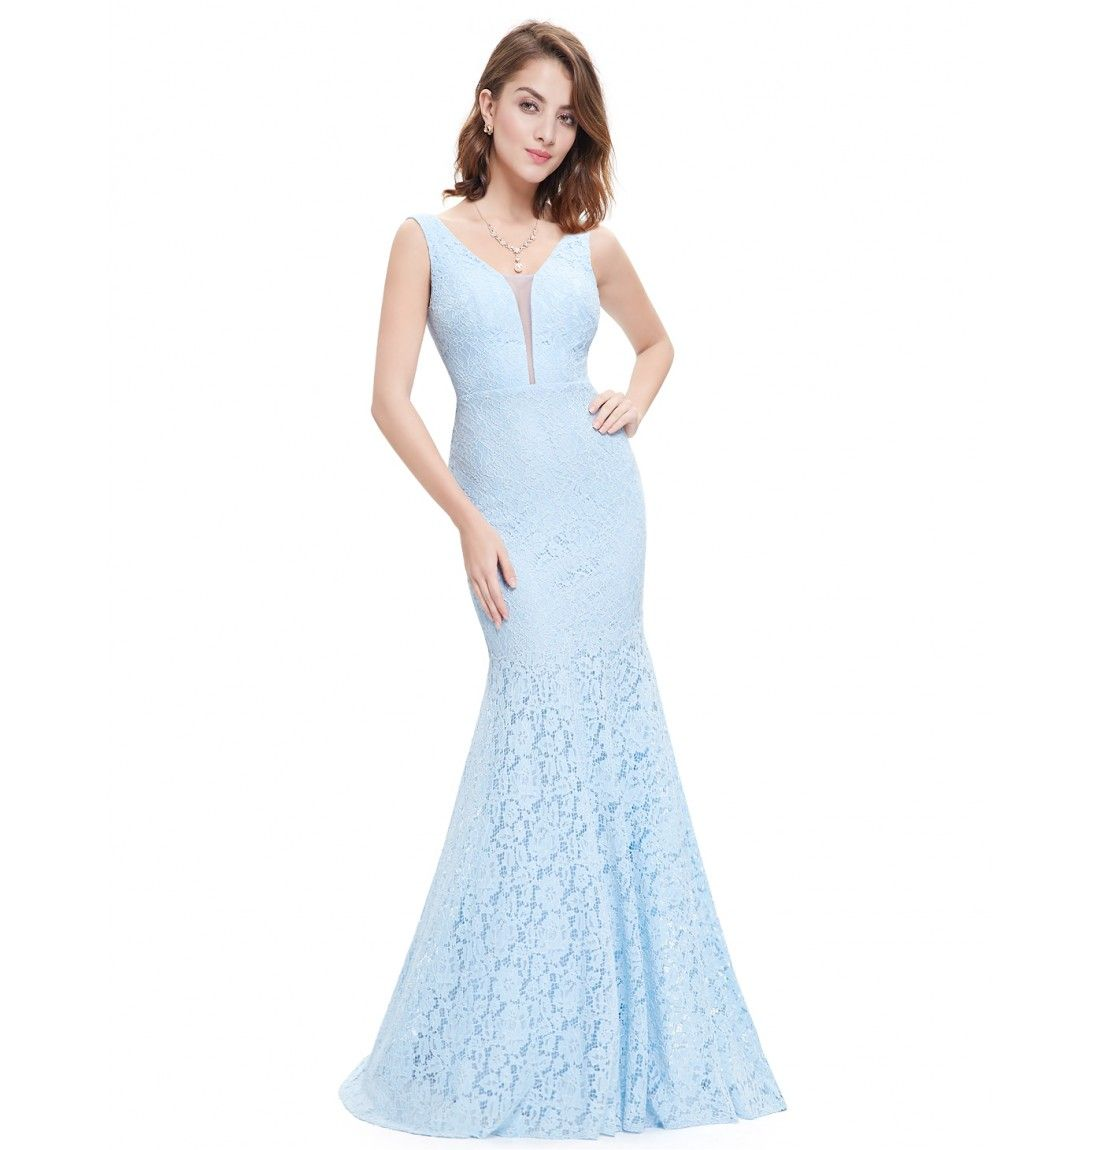 spitzen damen meerjungfrau abendkleid hellblau hellblau pinterest meerjungfrau abendkleid. Black Bedroom Furniture Sets. Home Design Ideas